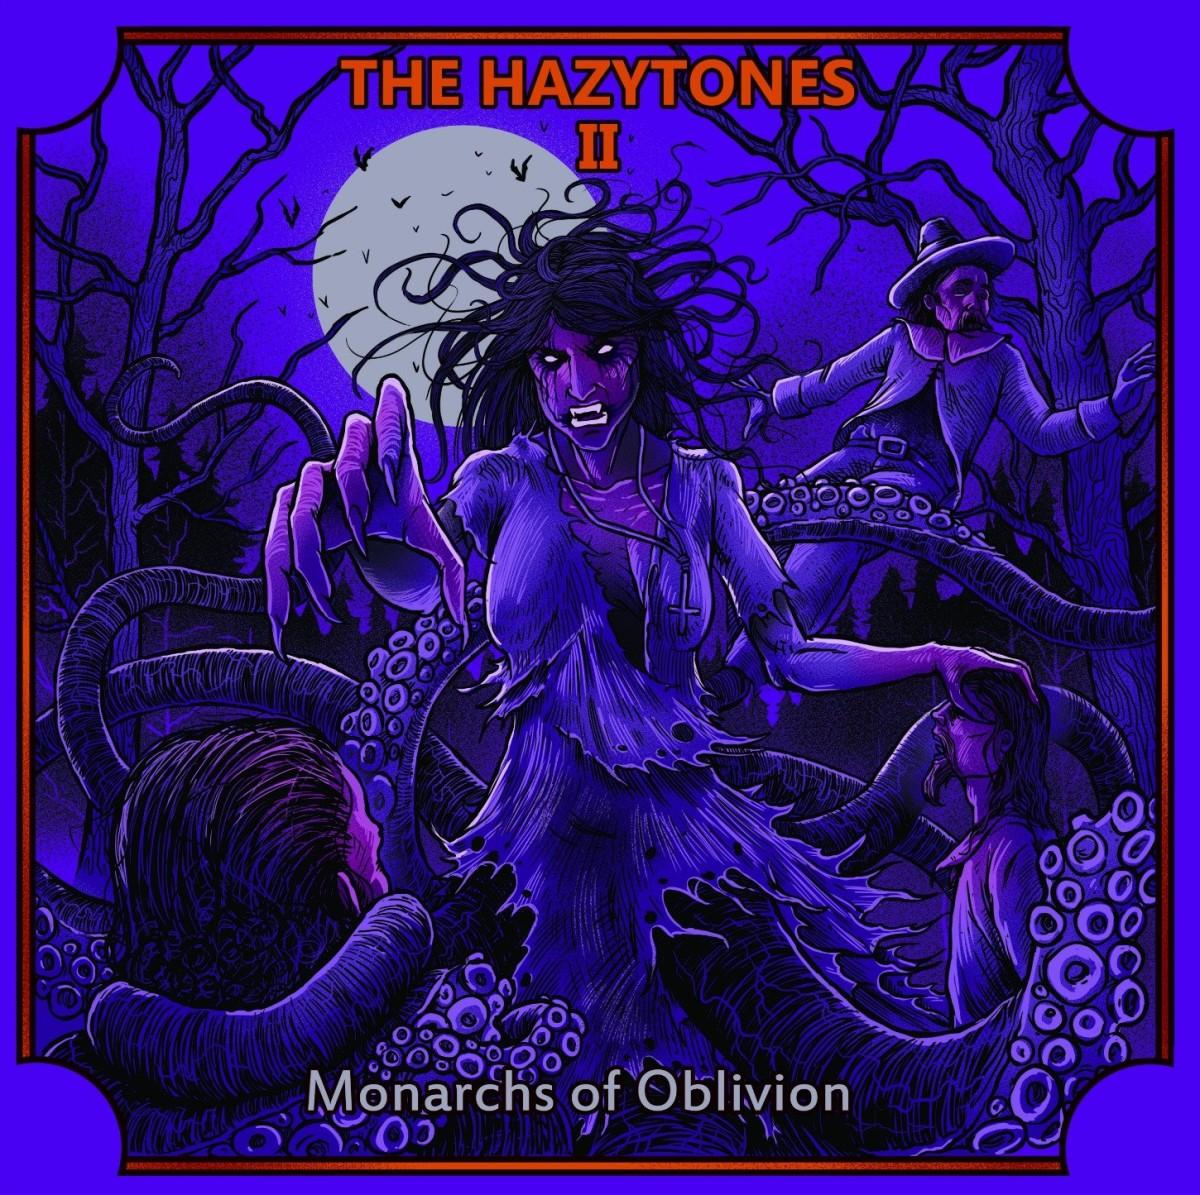 The Hazytones Monarchs of Oblivion premiere